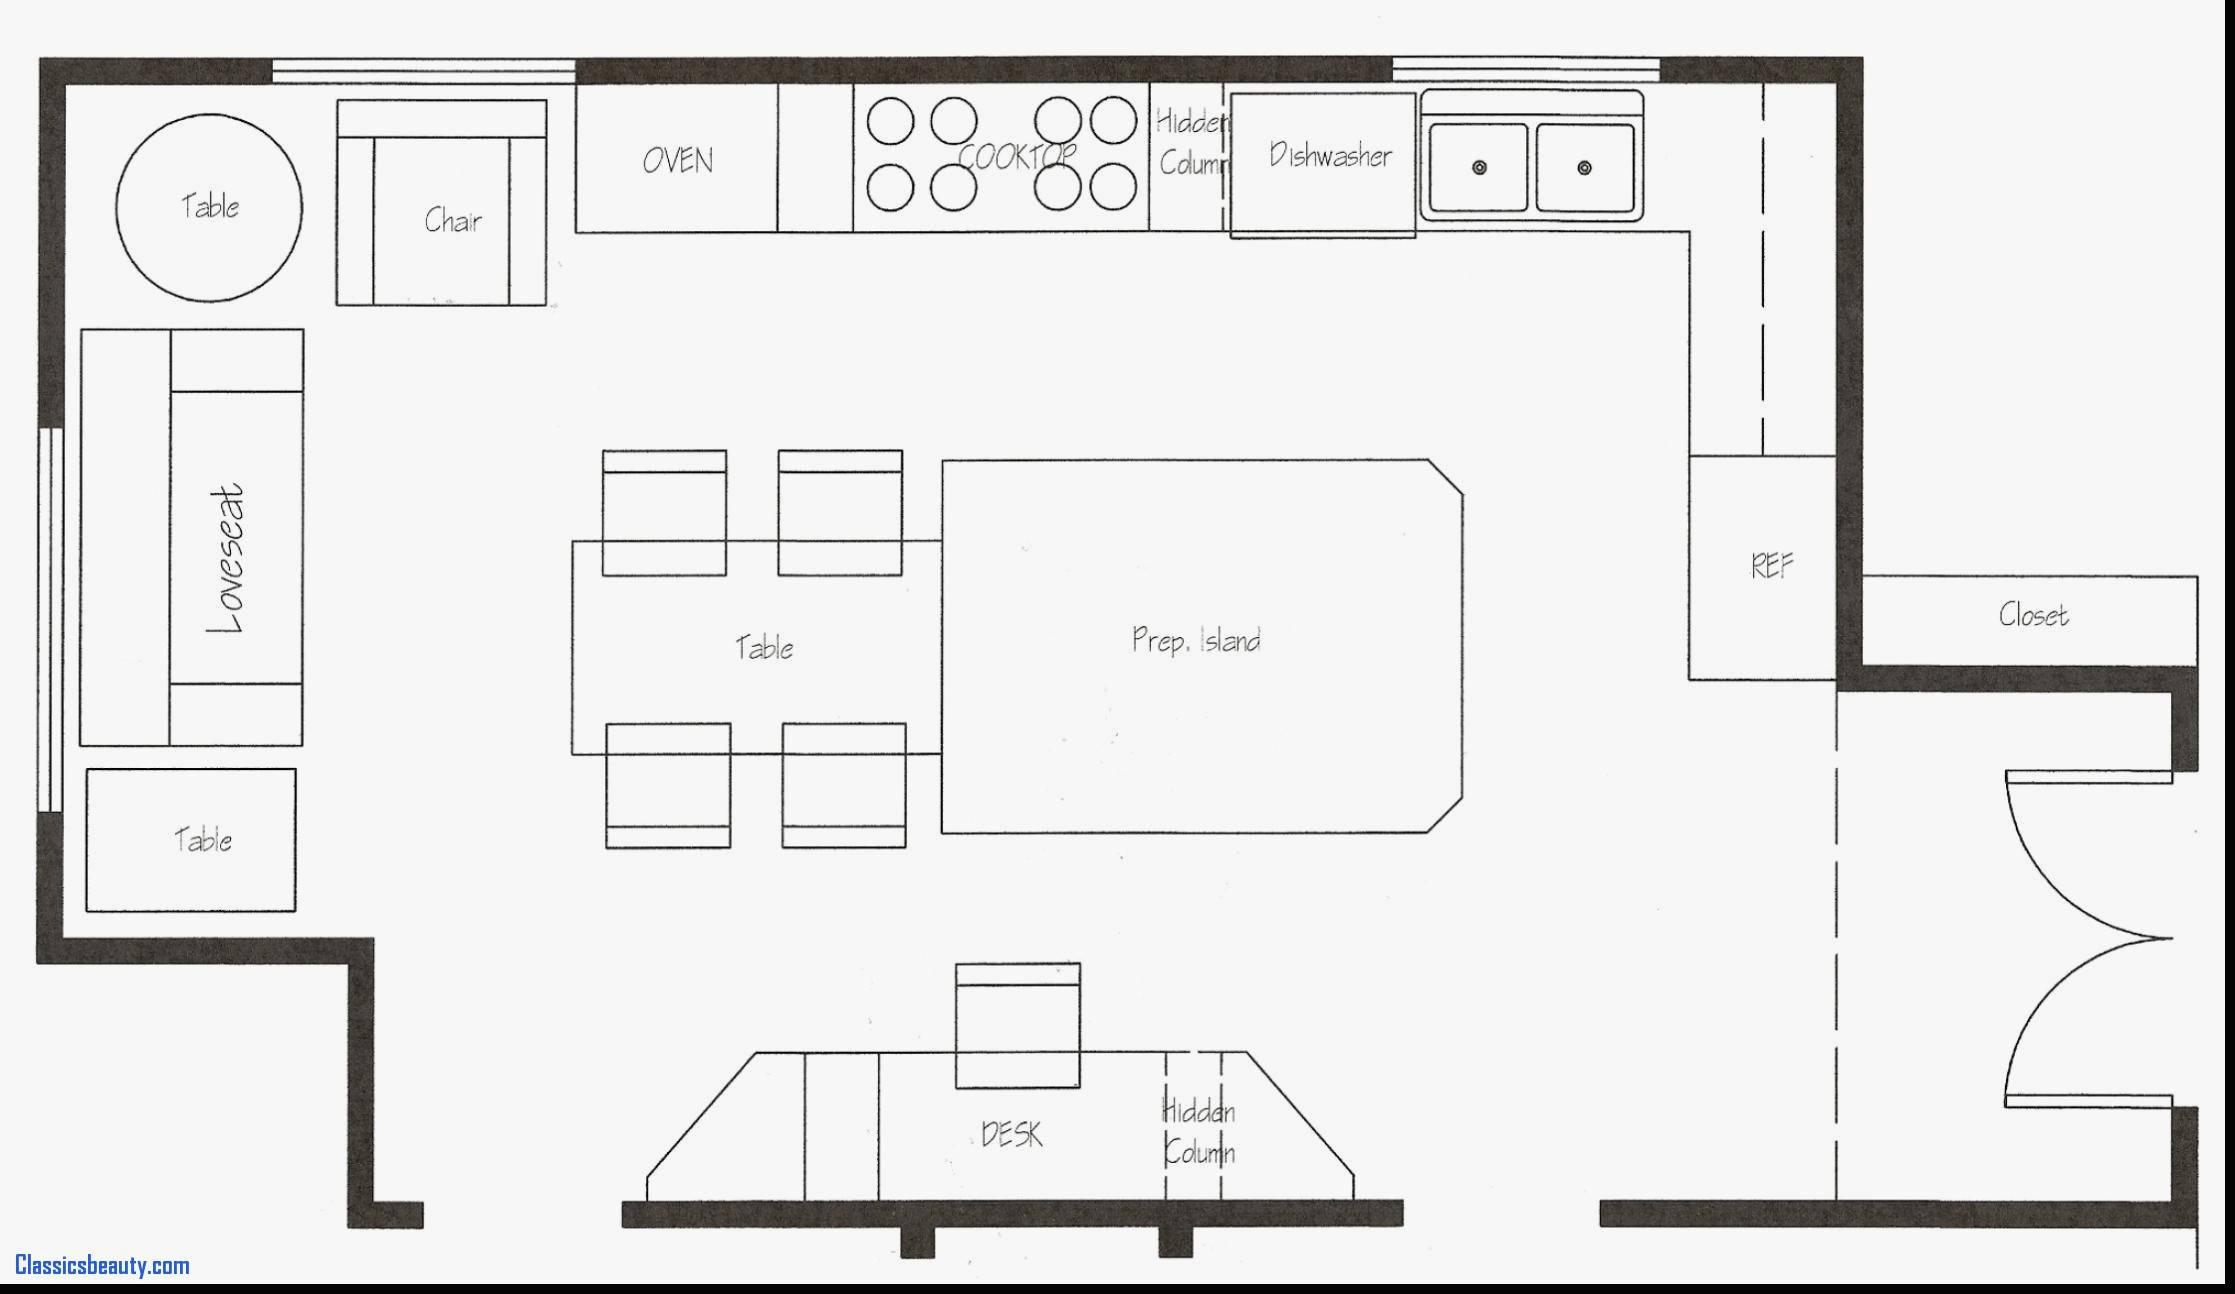 Kitchen Layout Templates Free